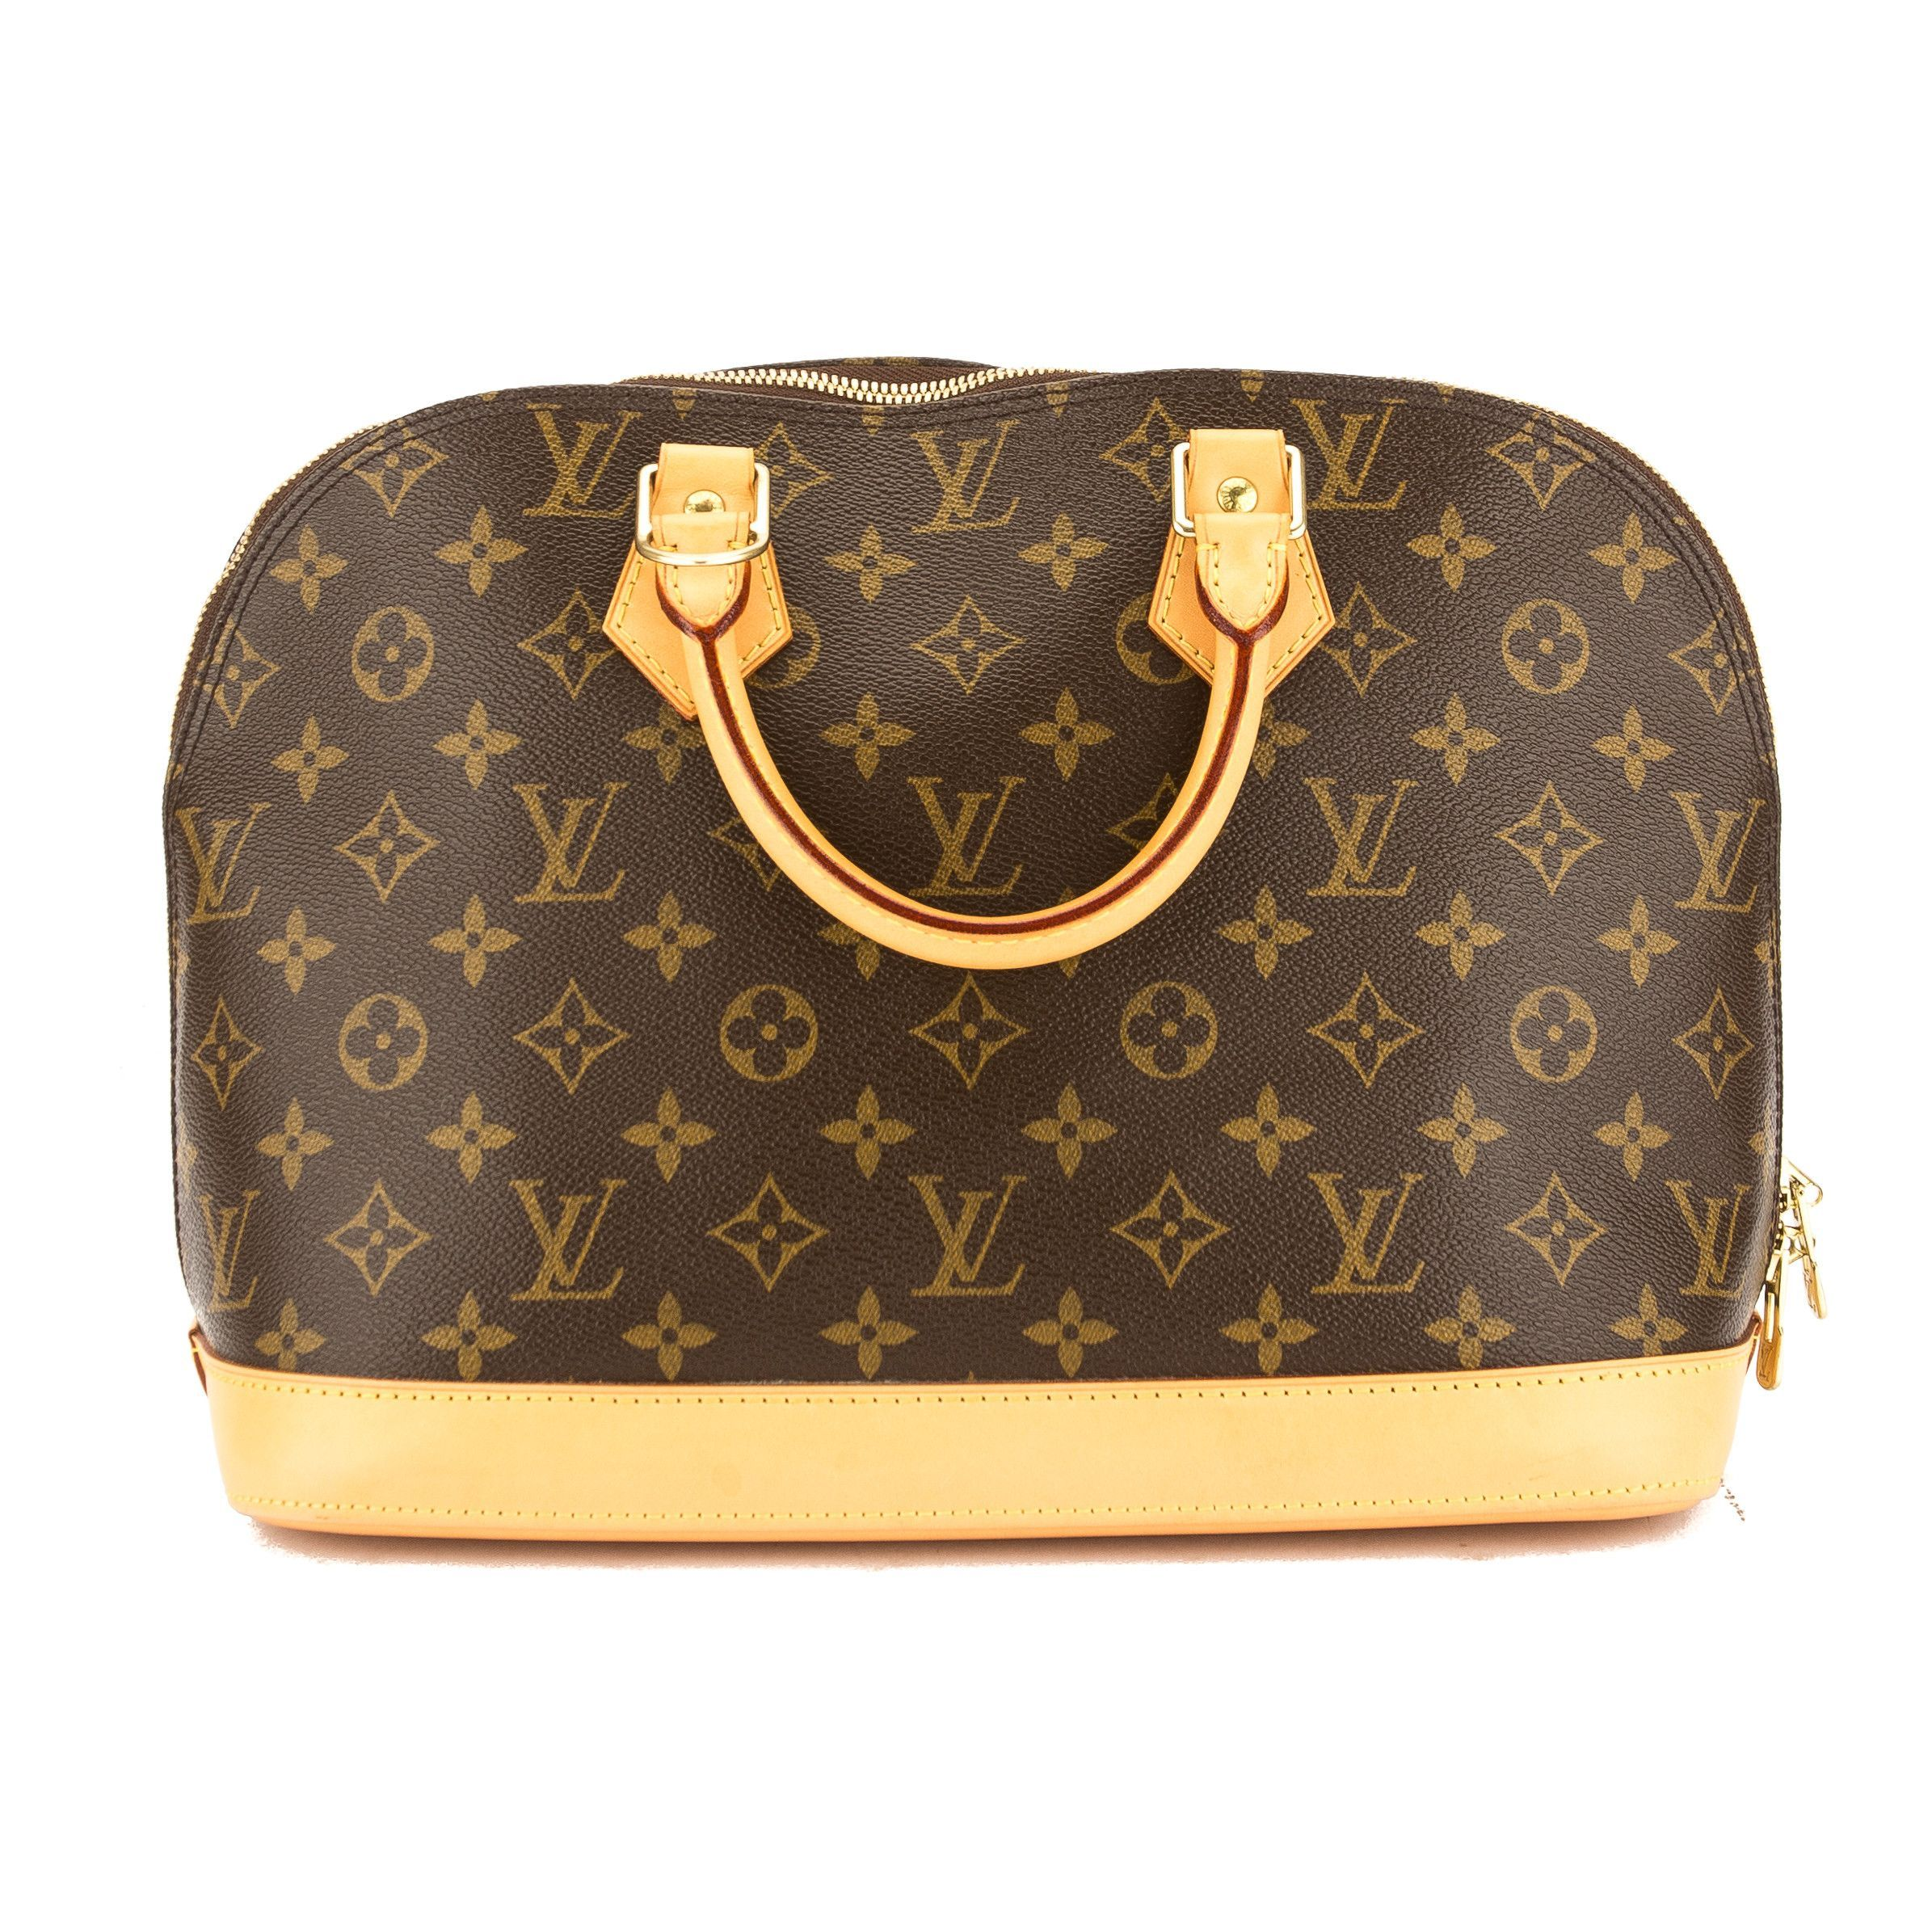 Louis Vuitton Monogram Canvas Alma Bag (Pre Owned)